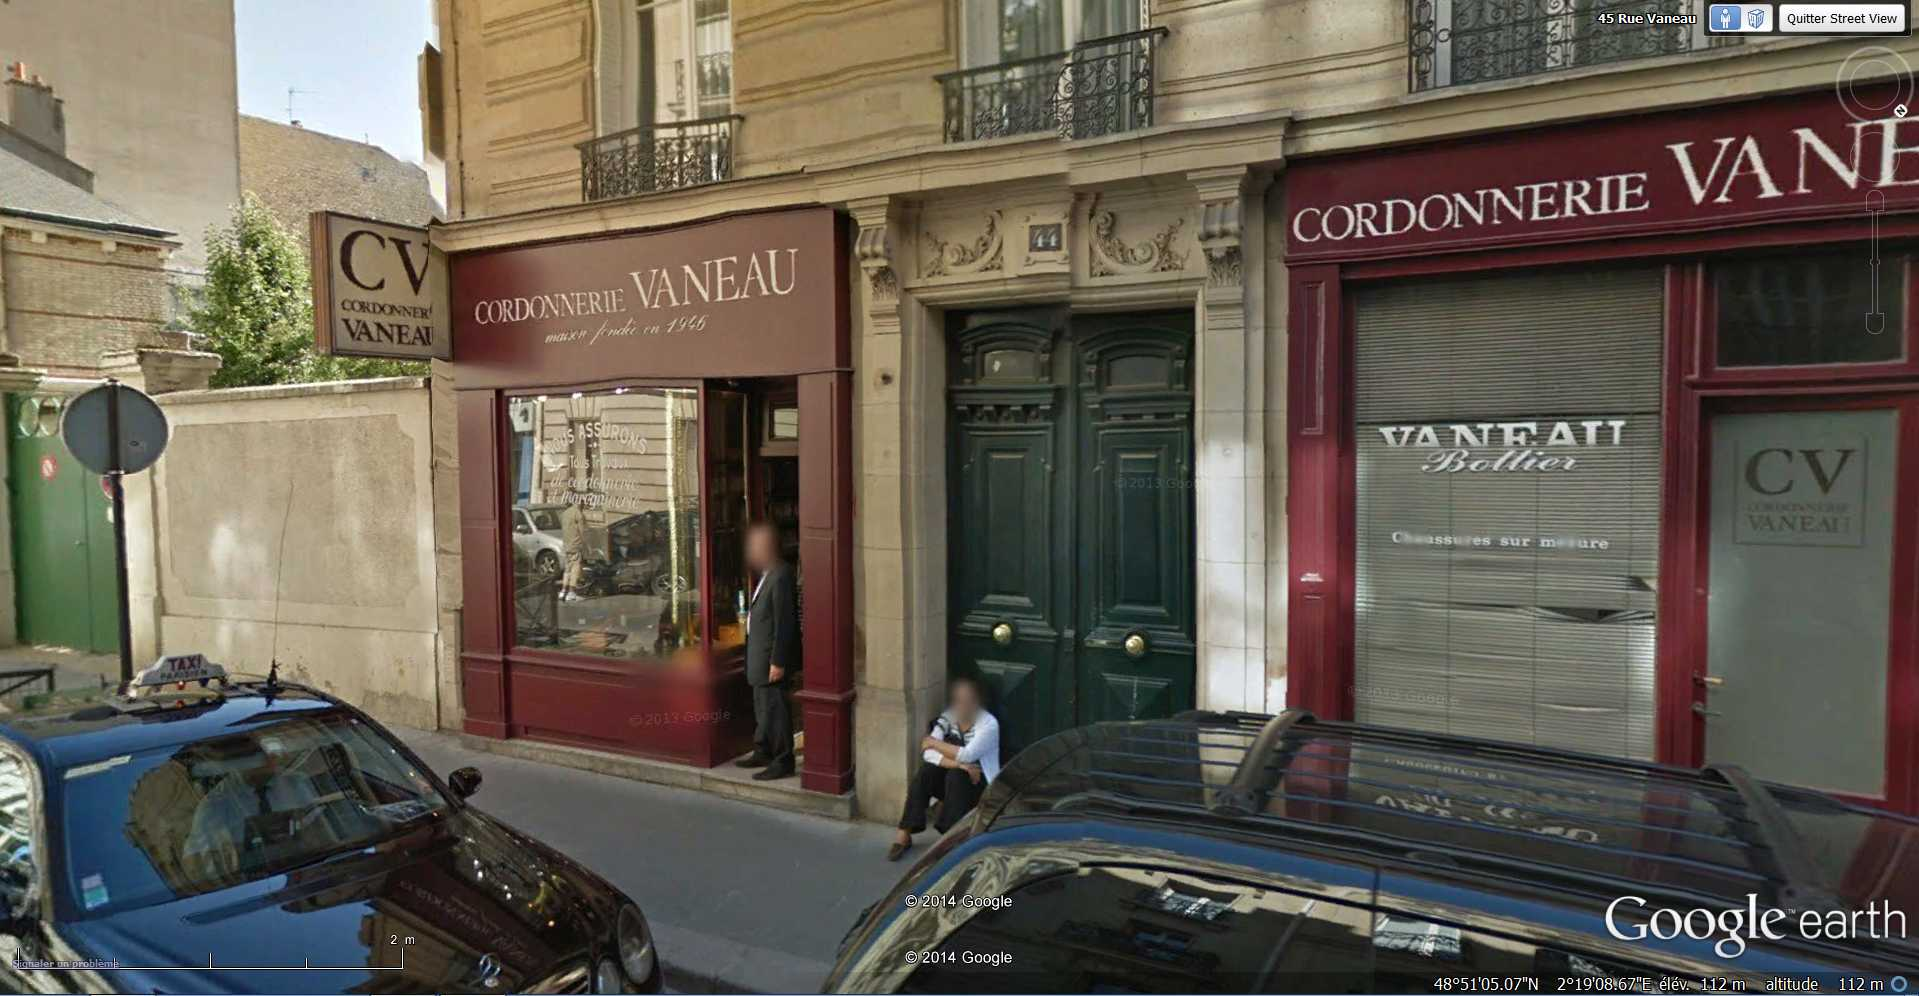 STREET VIEW : Chute de moto - rue Vaneau - Paris - France  2014-320